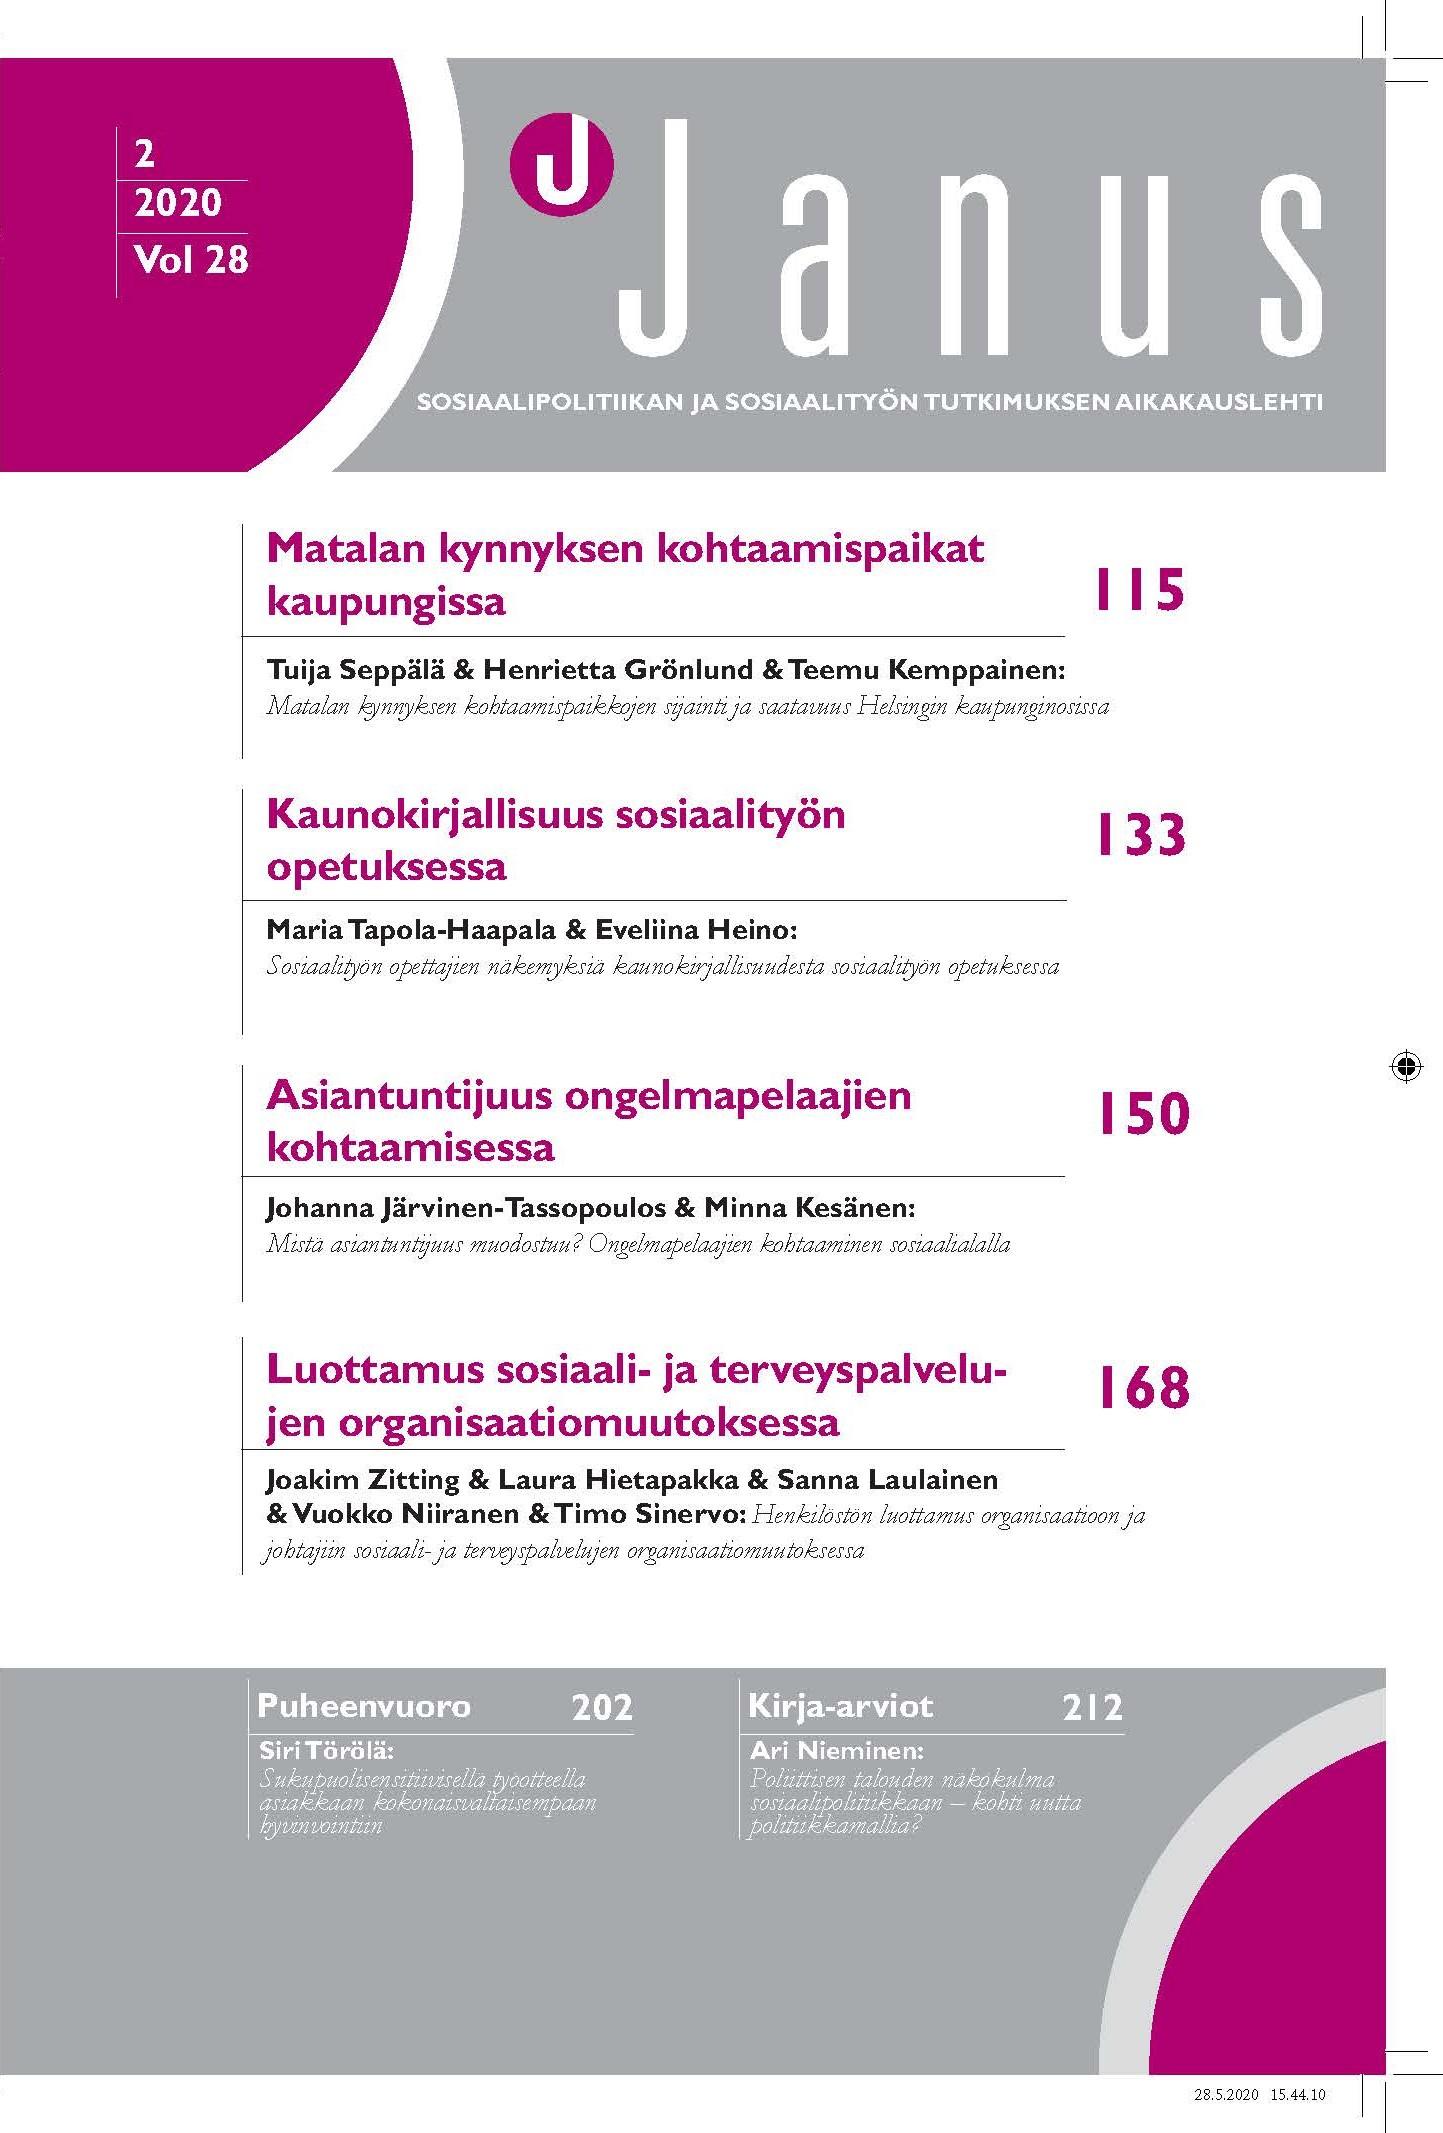 Vol 28 Nro 2 (2020): Janus 28 (2)